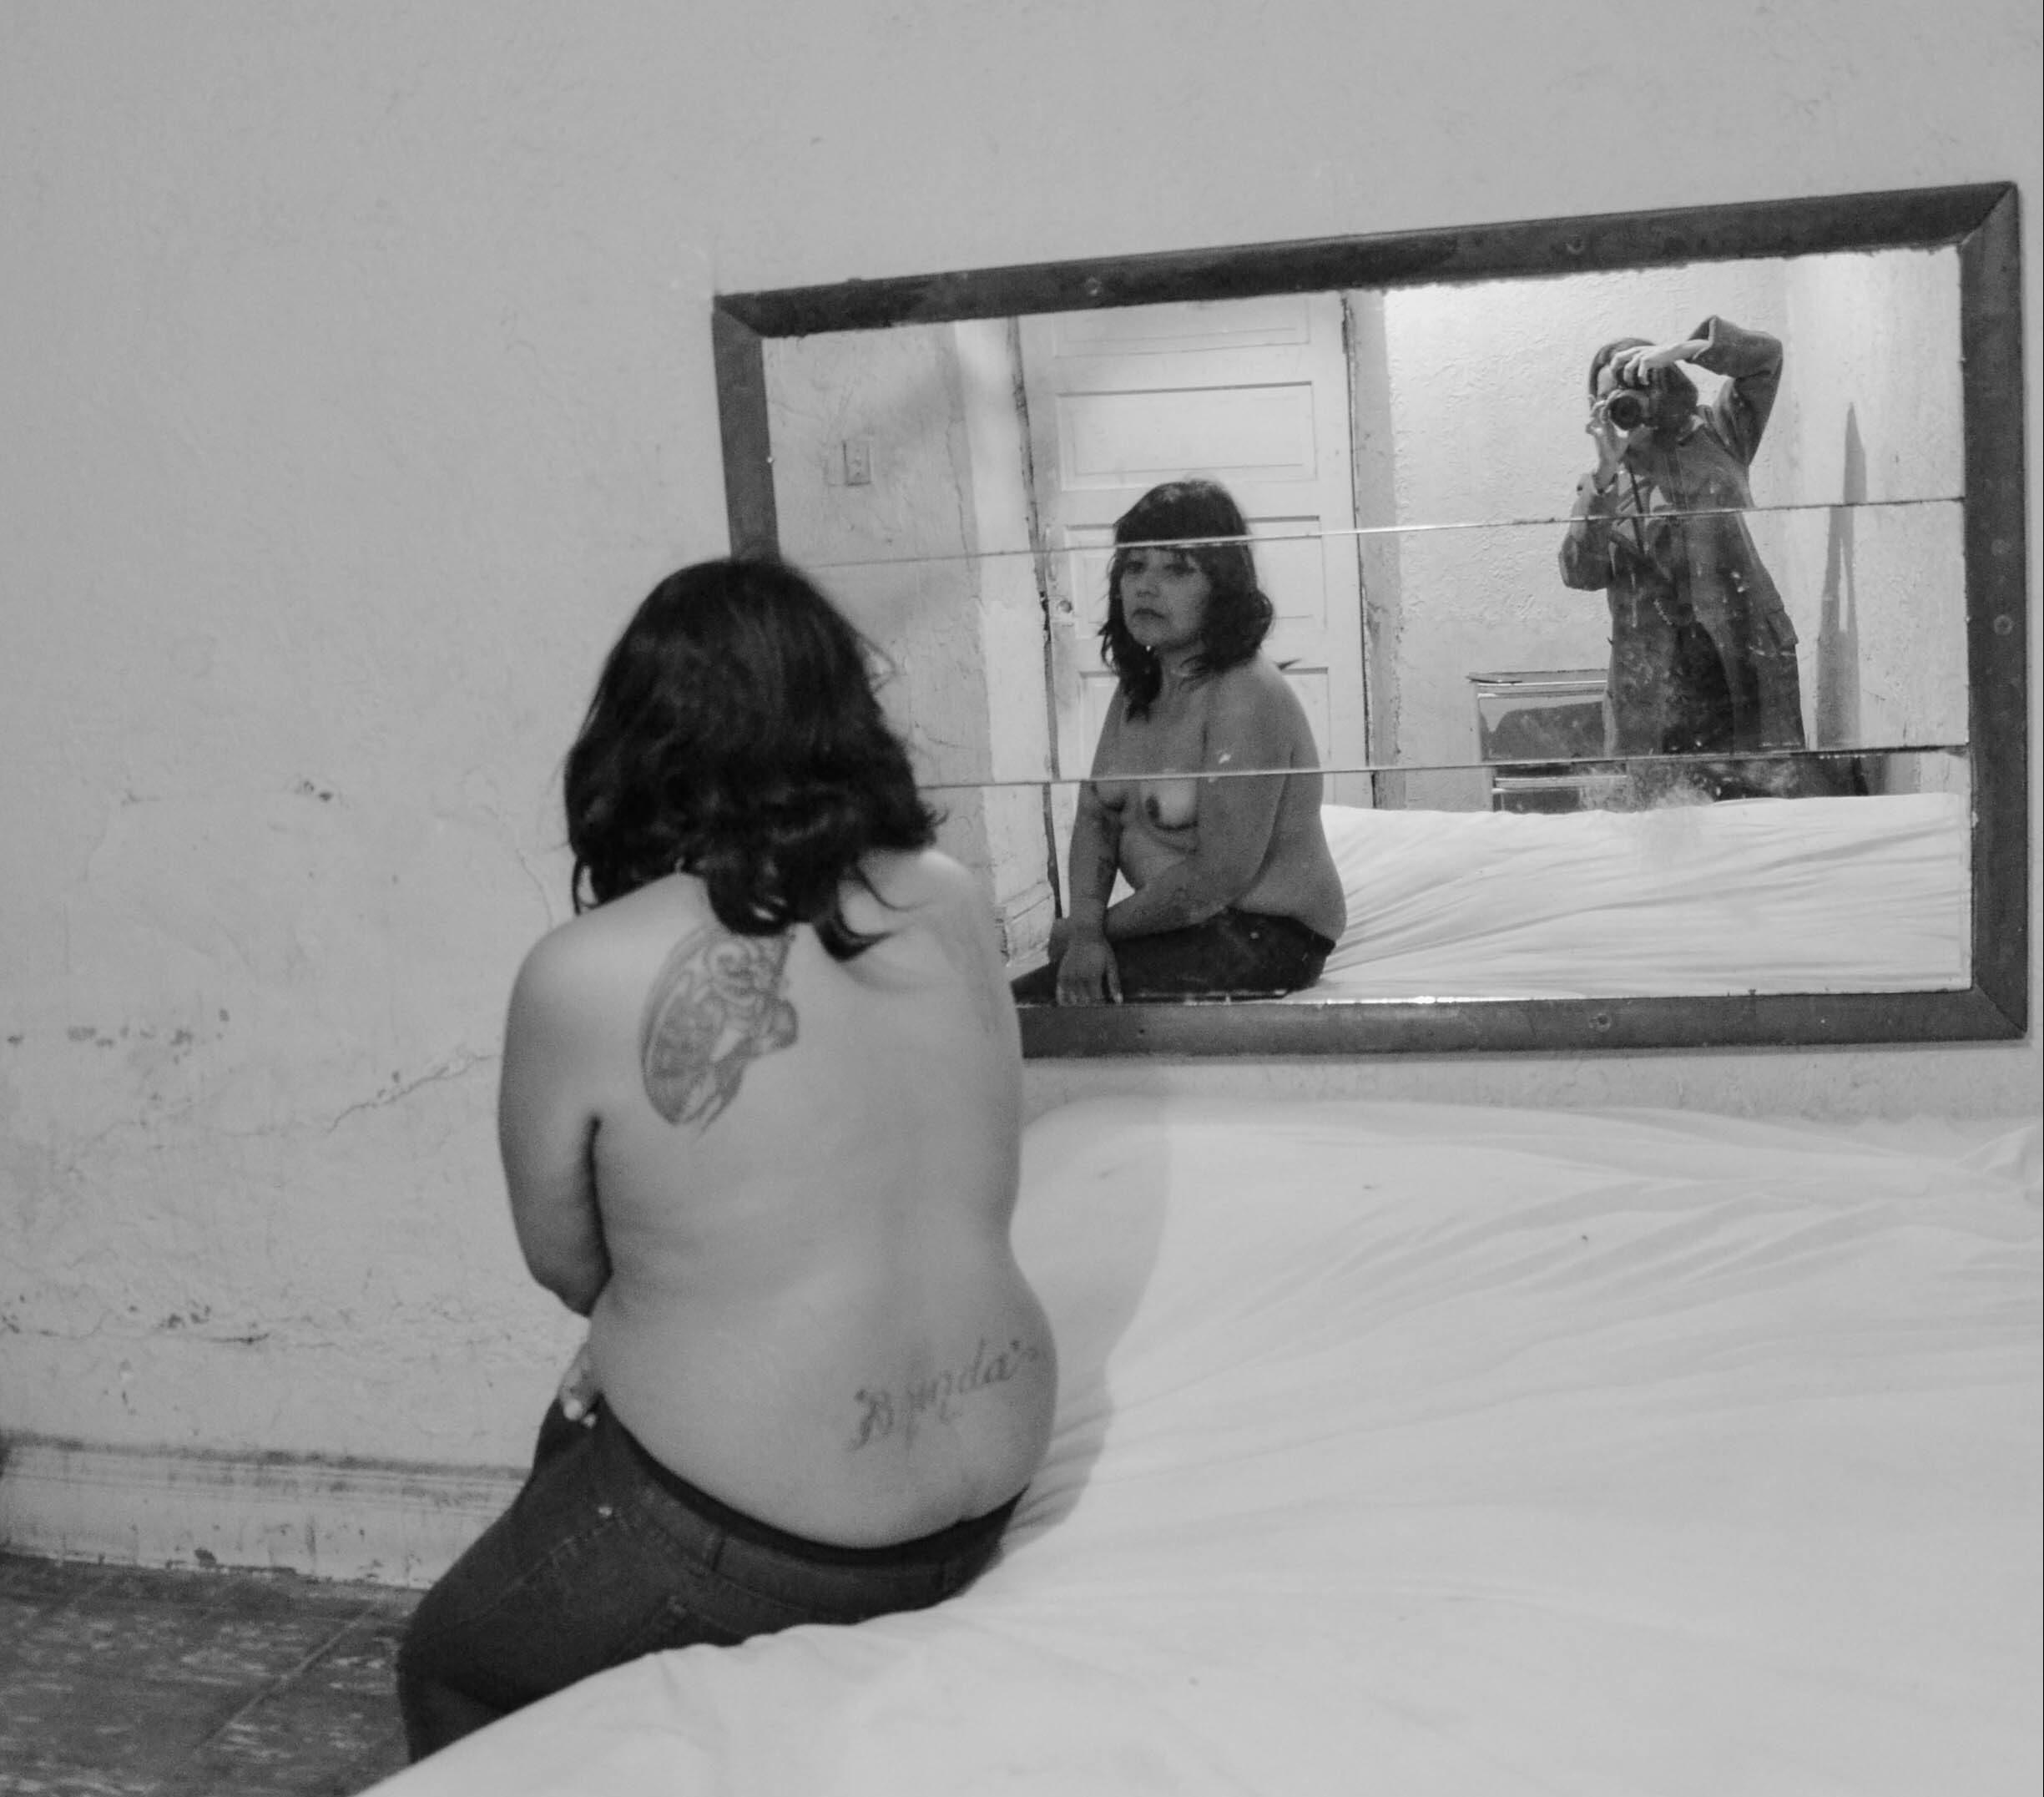 Ada Trillo´s photo from a Juarez brothel.